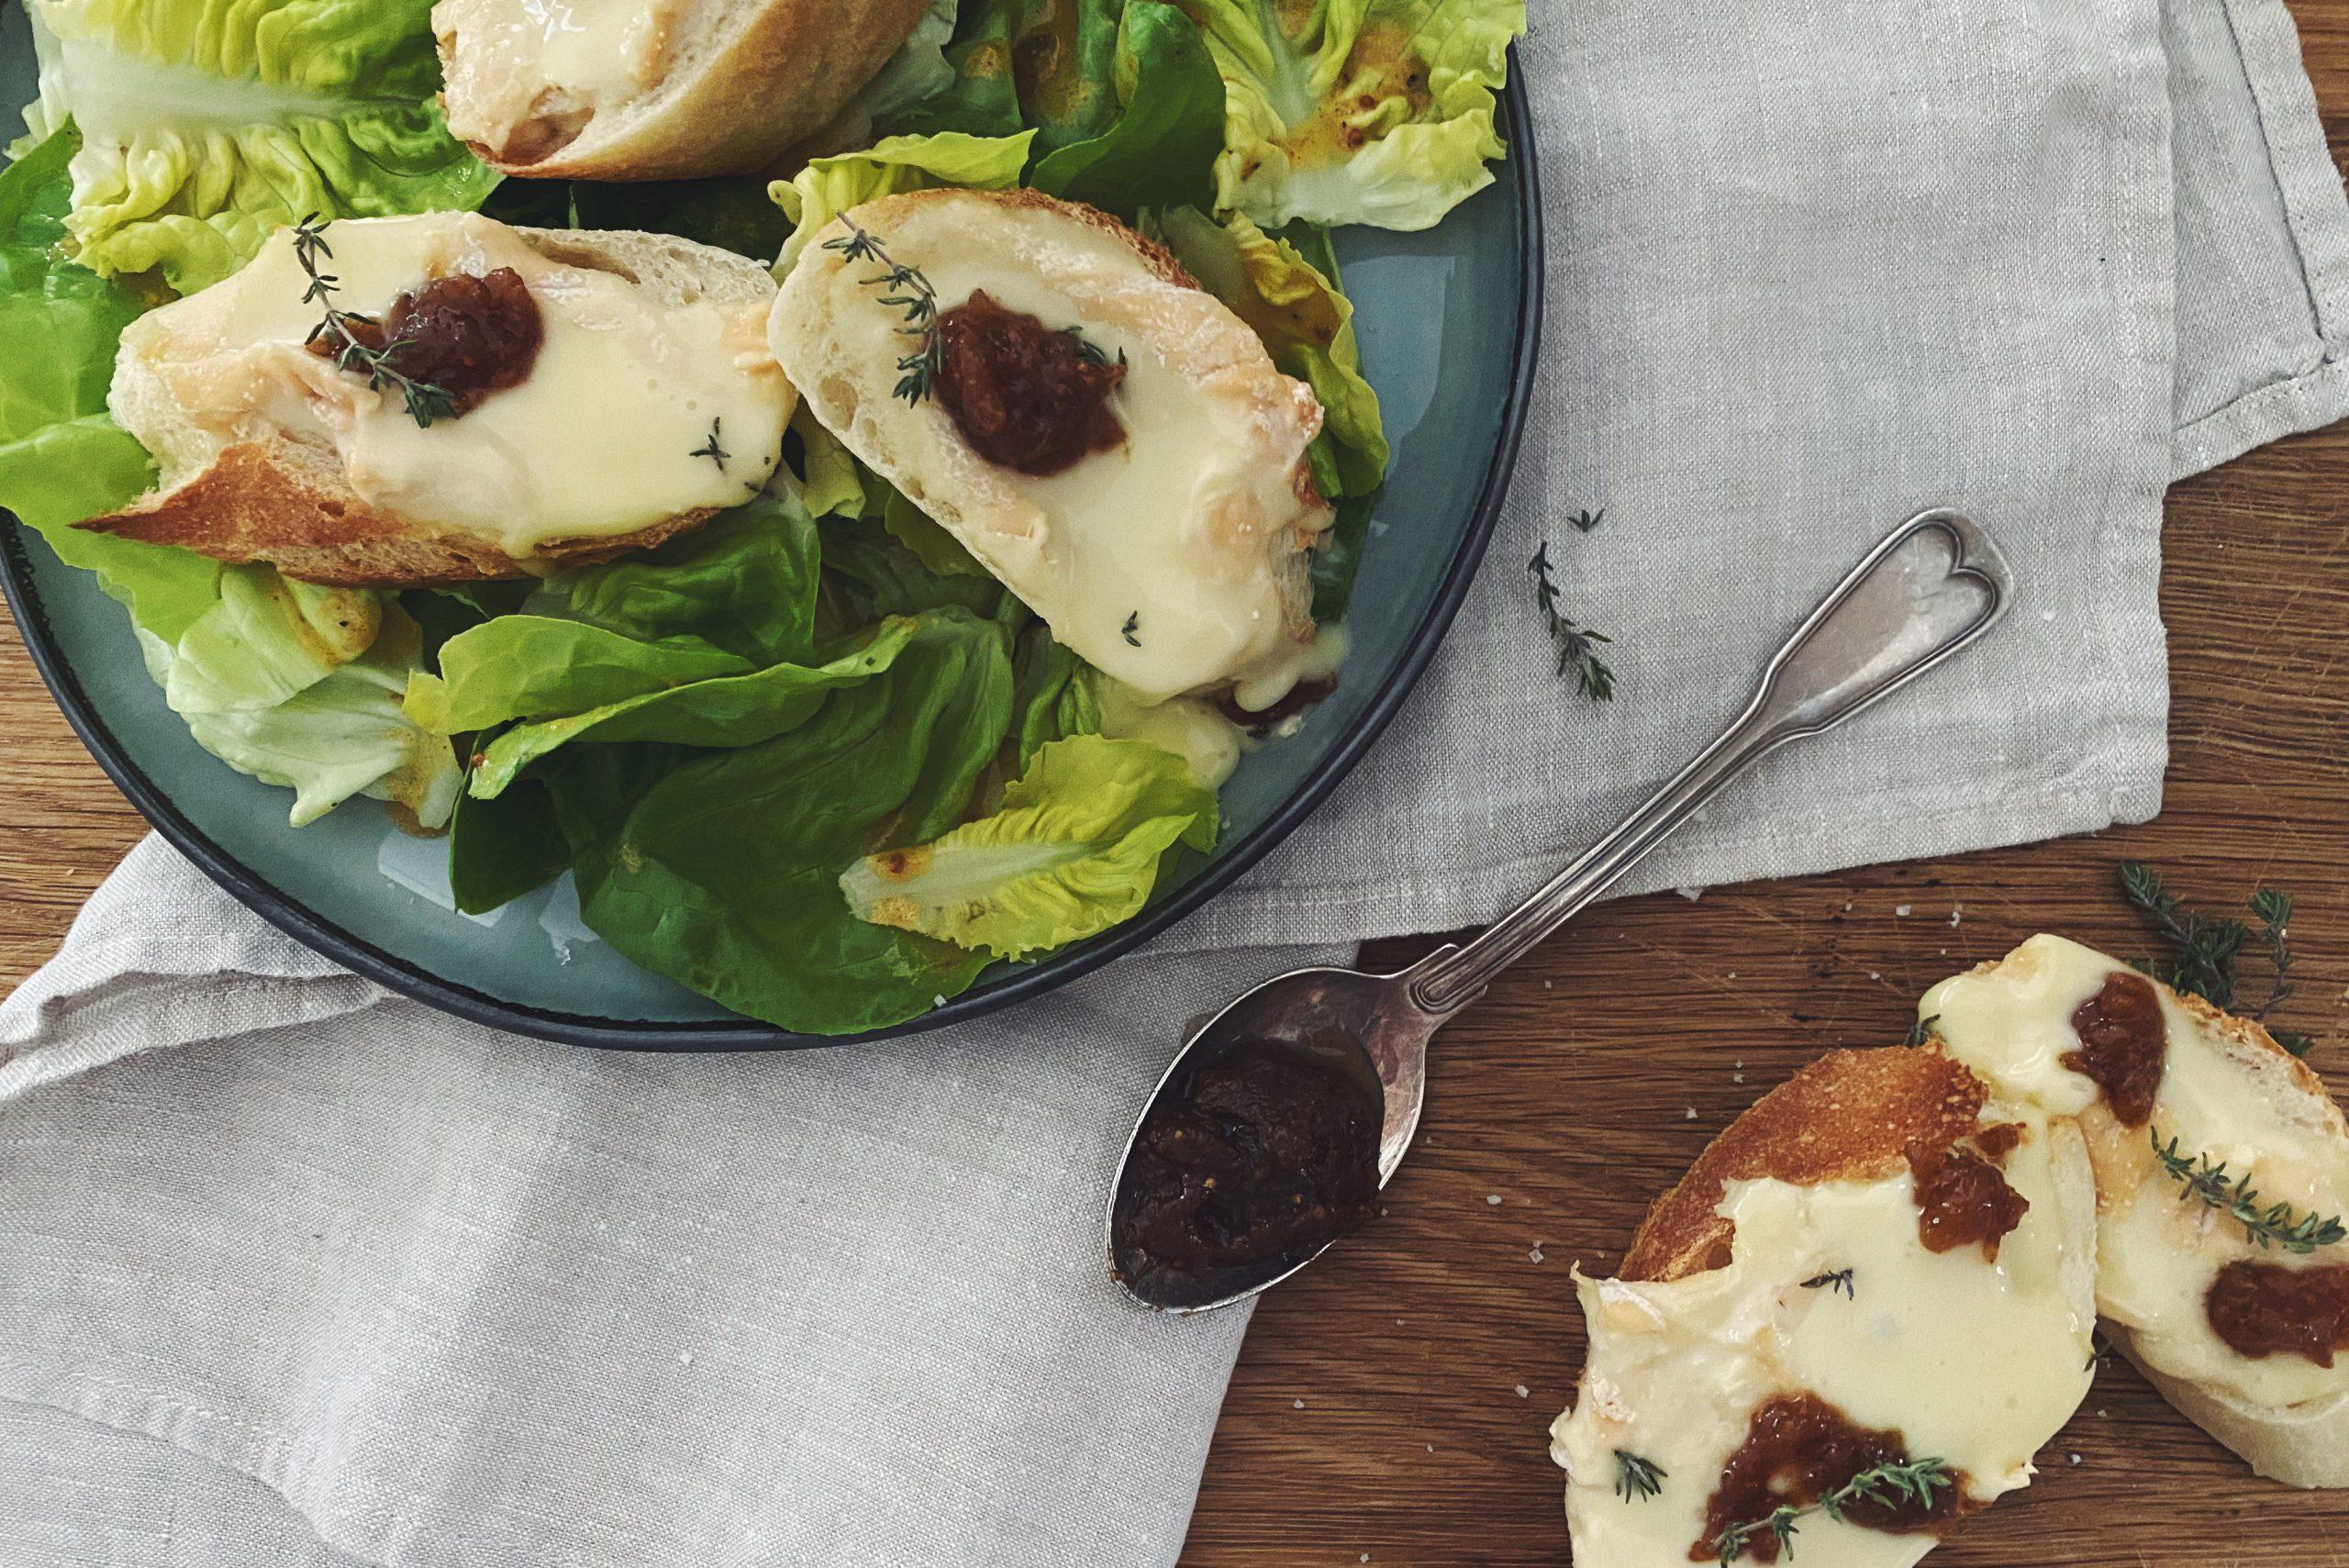 Vive le Frühling - oder Salade de fromage chaud